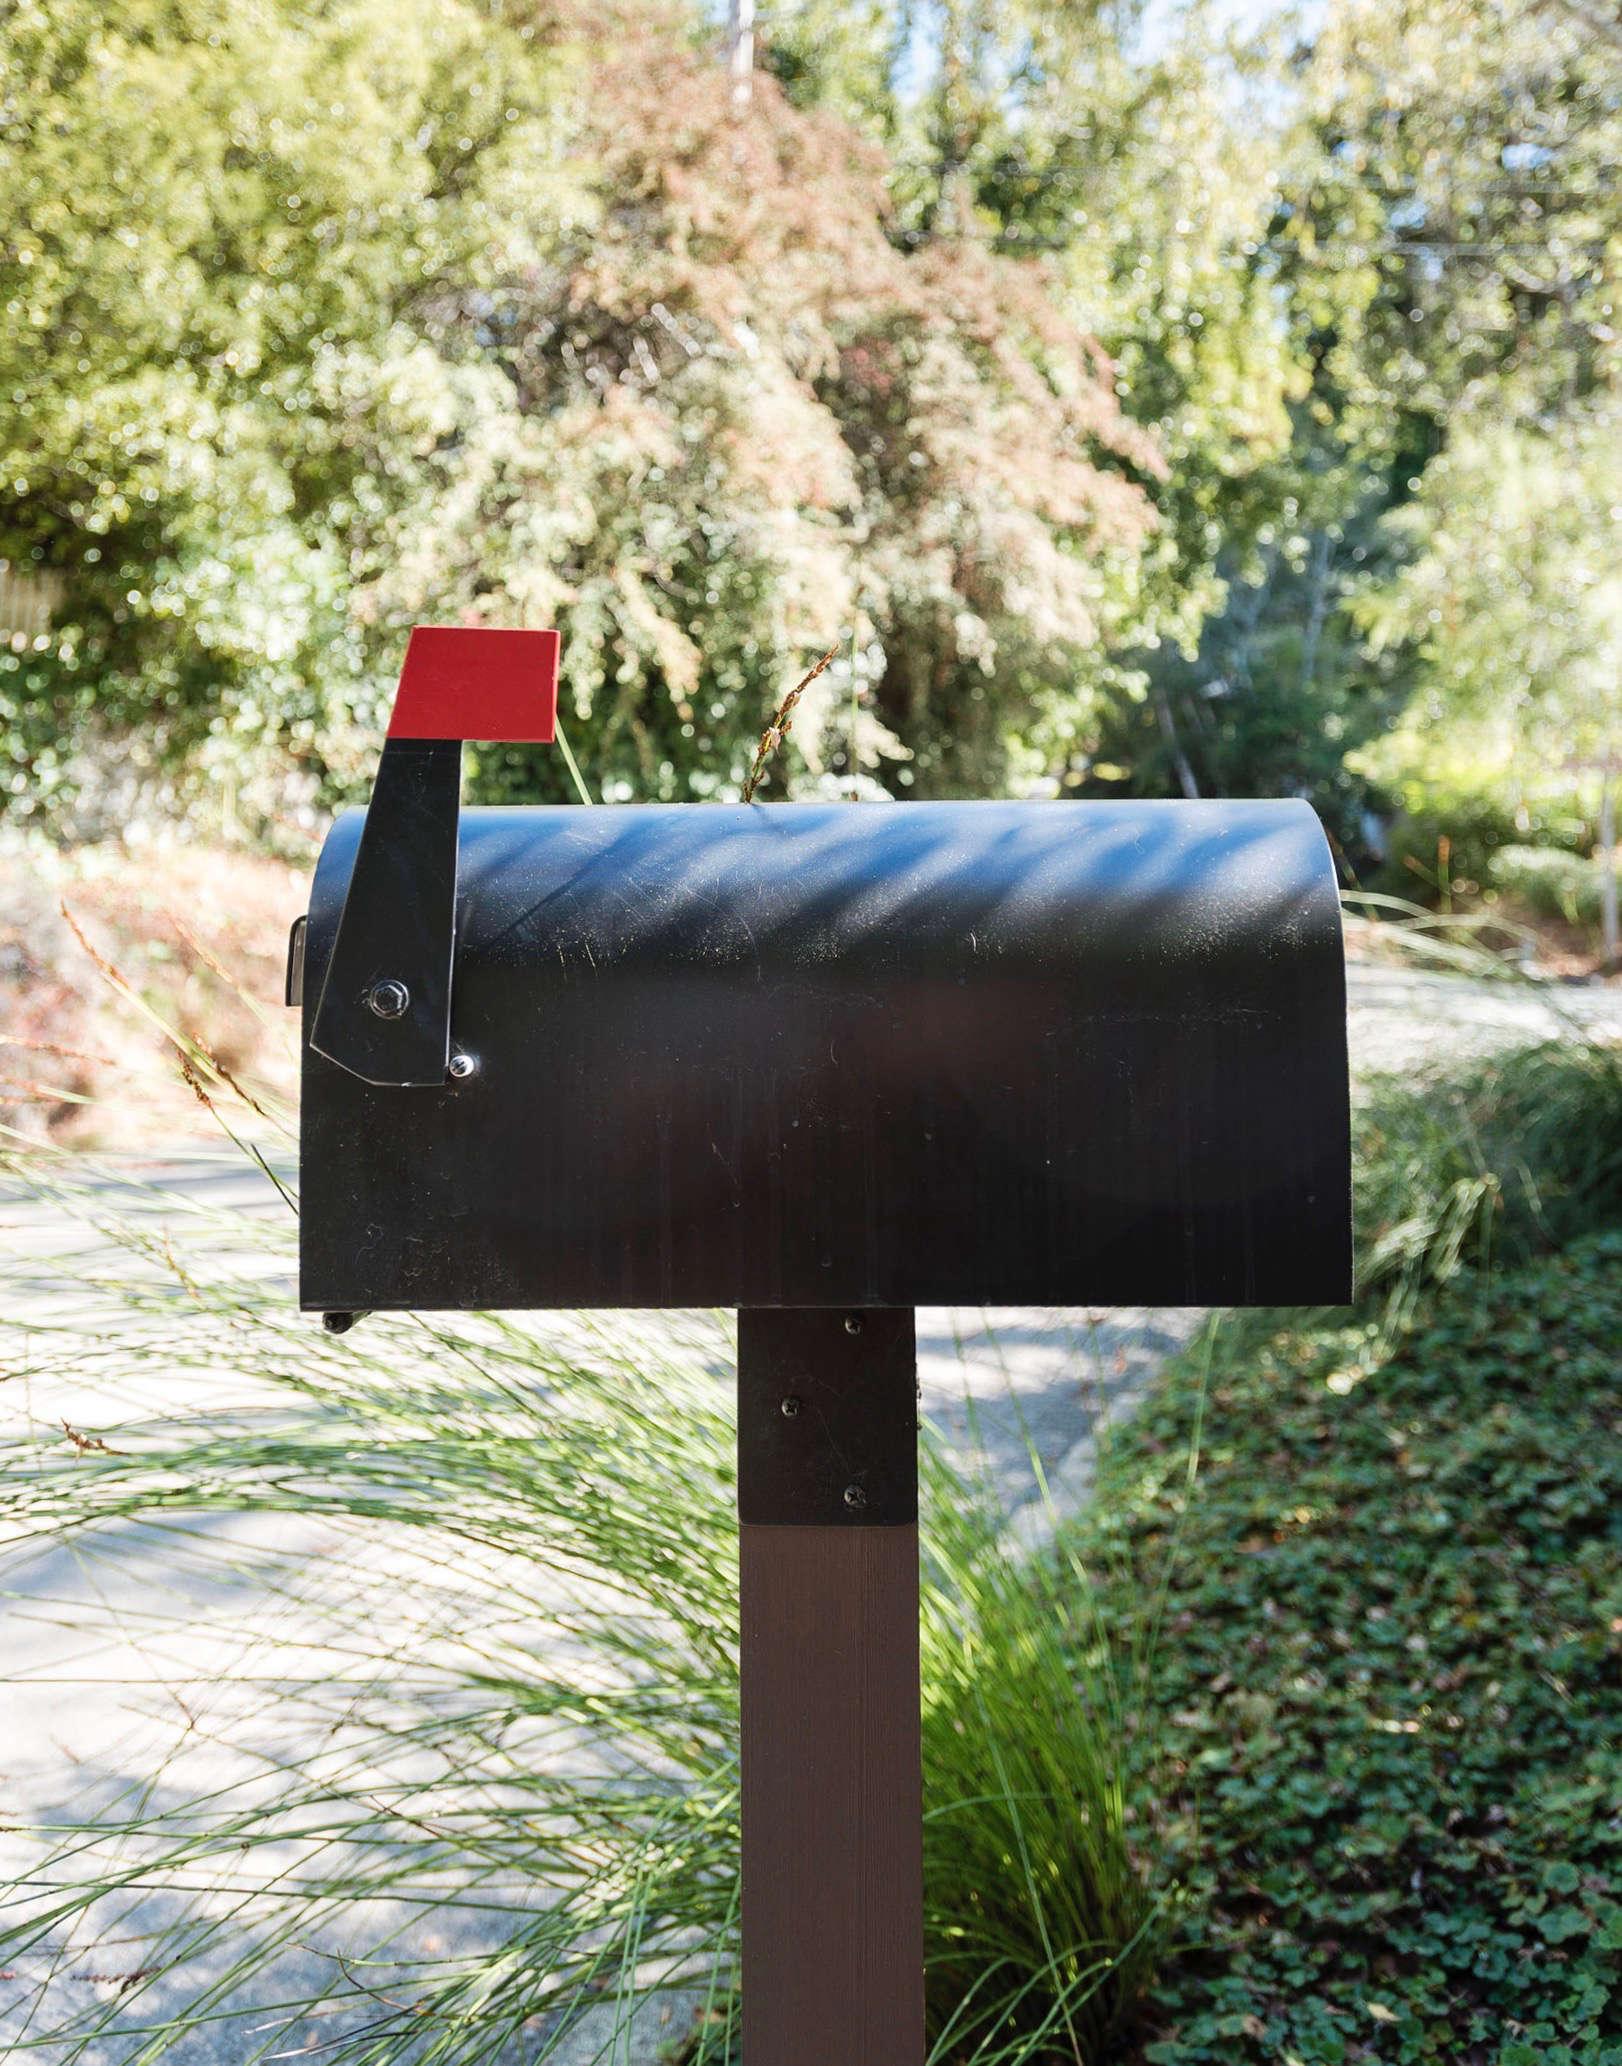 veeders-mailbox-matthew-williams-DSC-0463